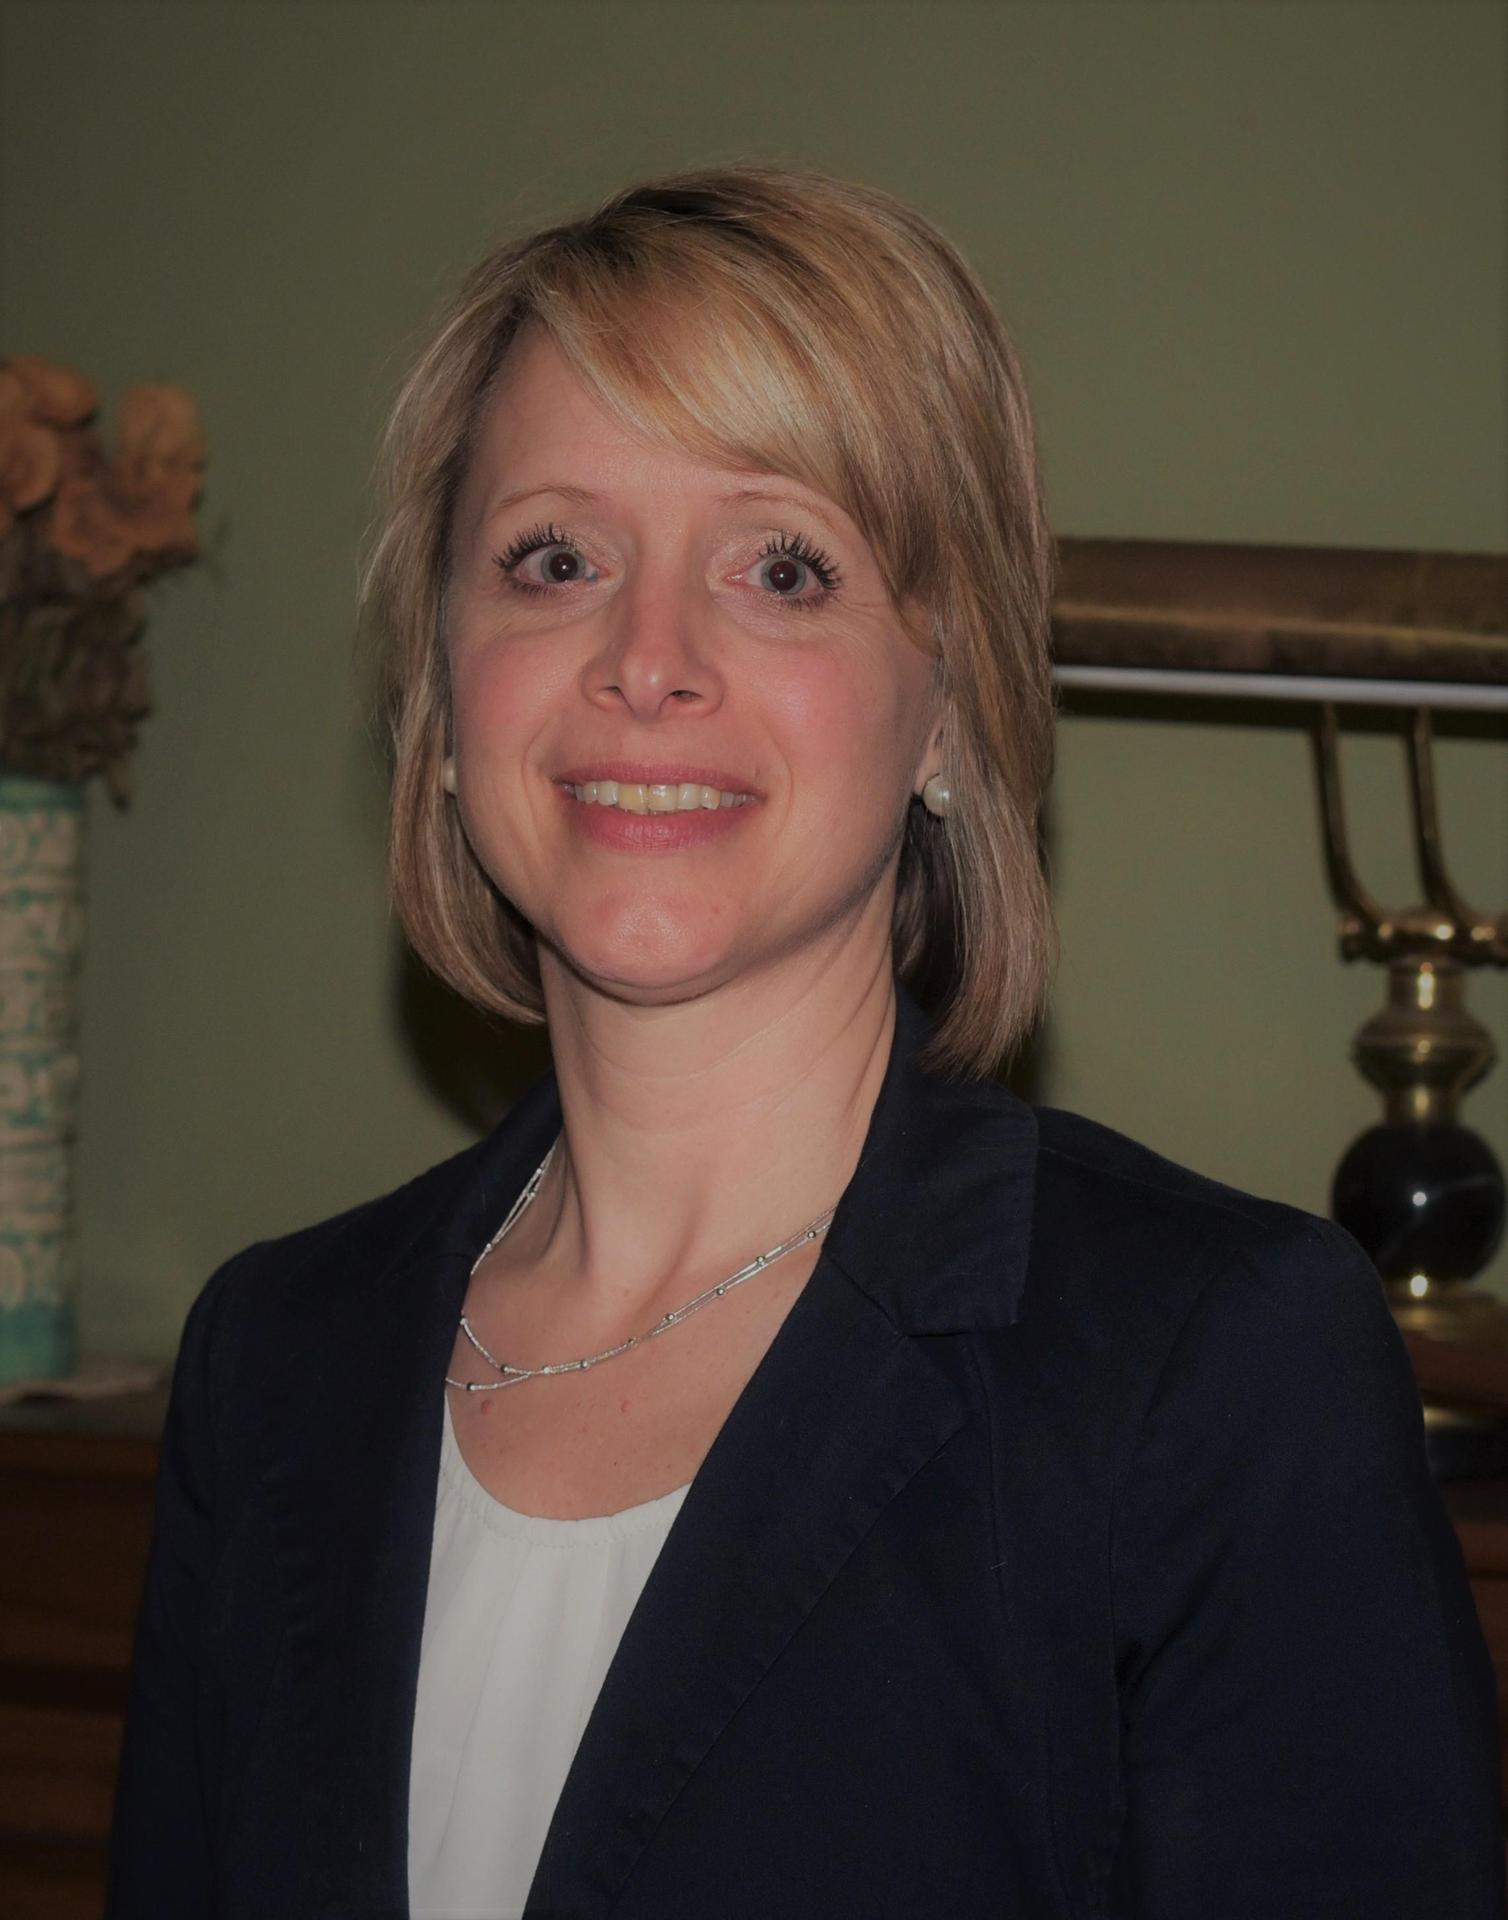 Deanna Wilkinson